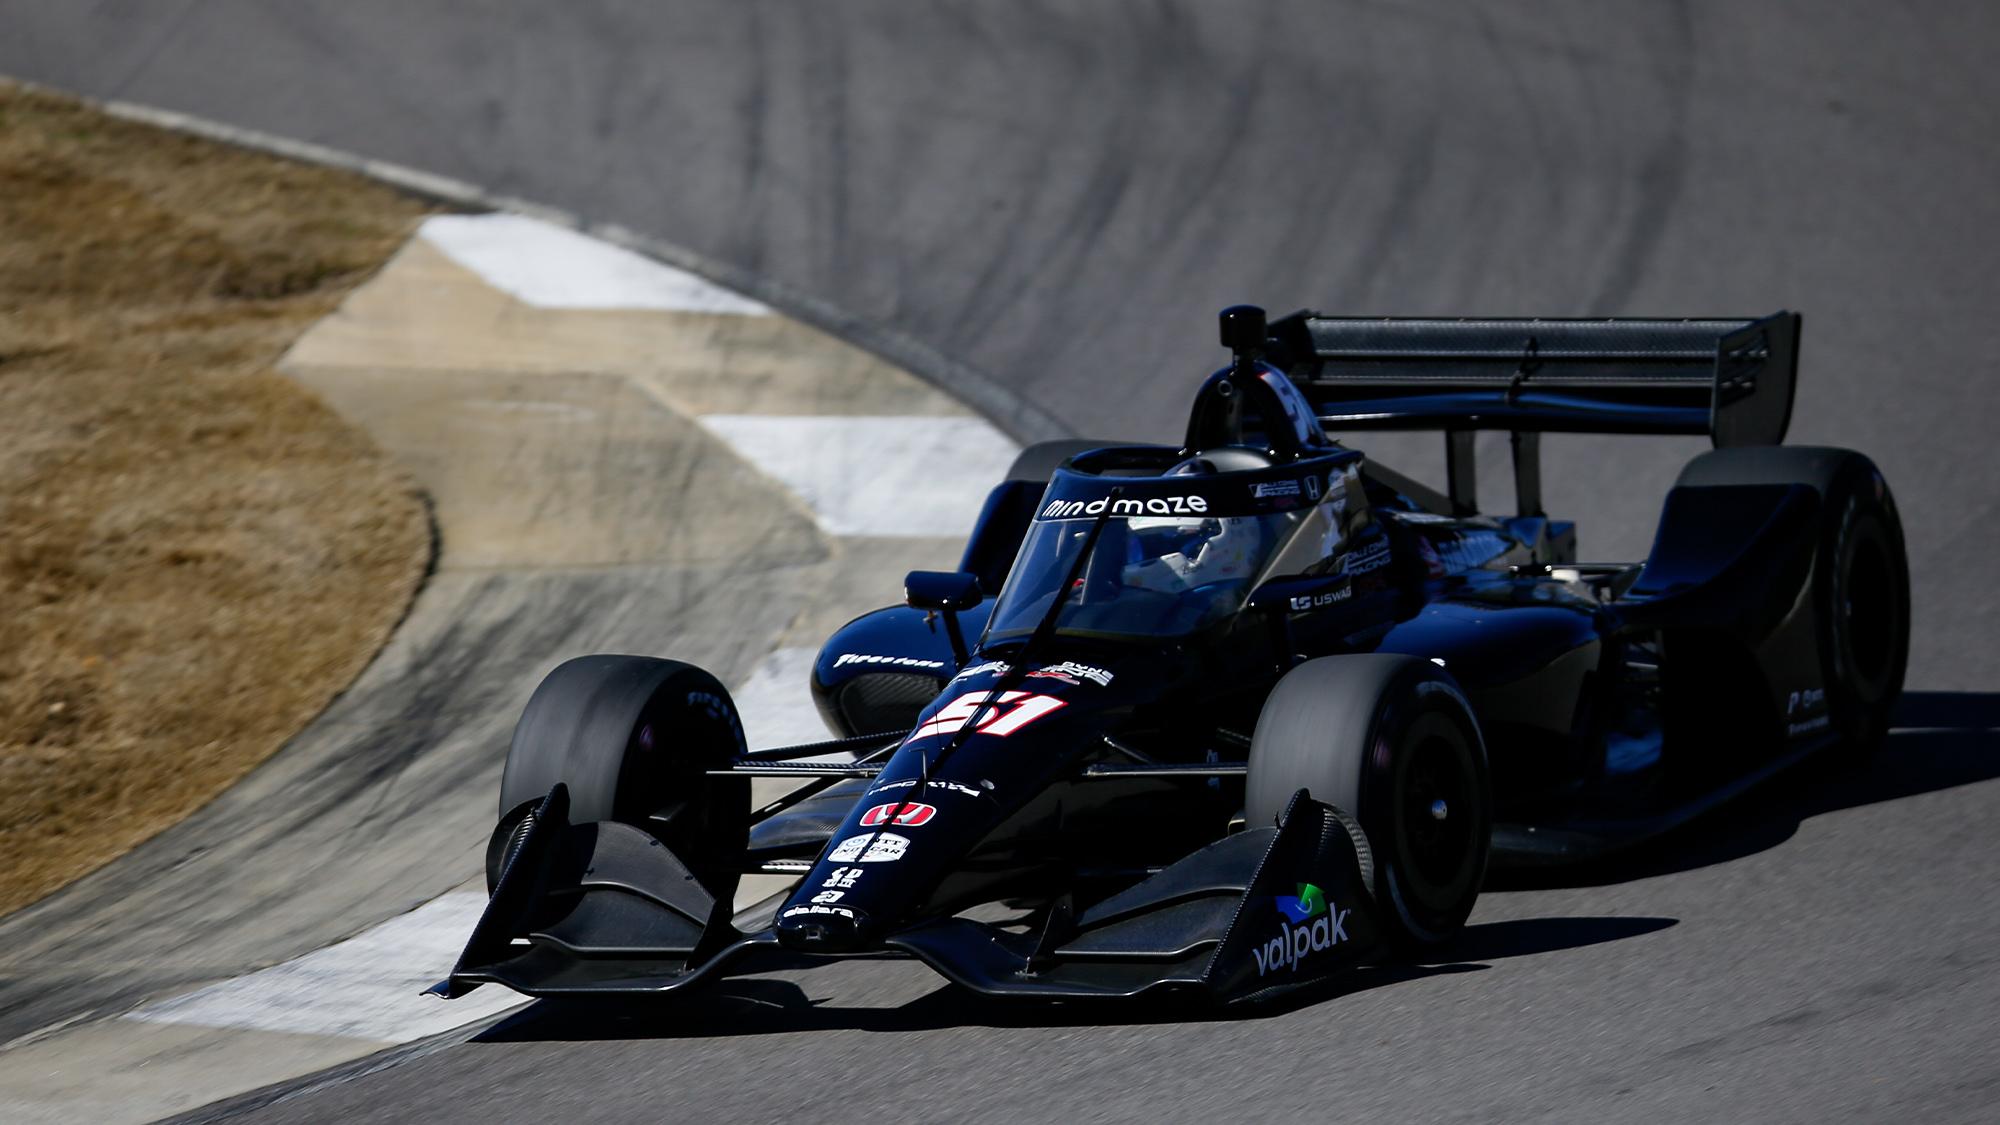 Romain Grosjean cornering in his 2021 Indycar test